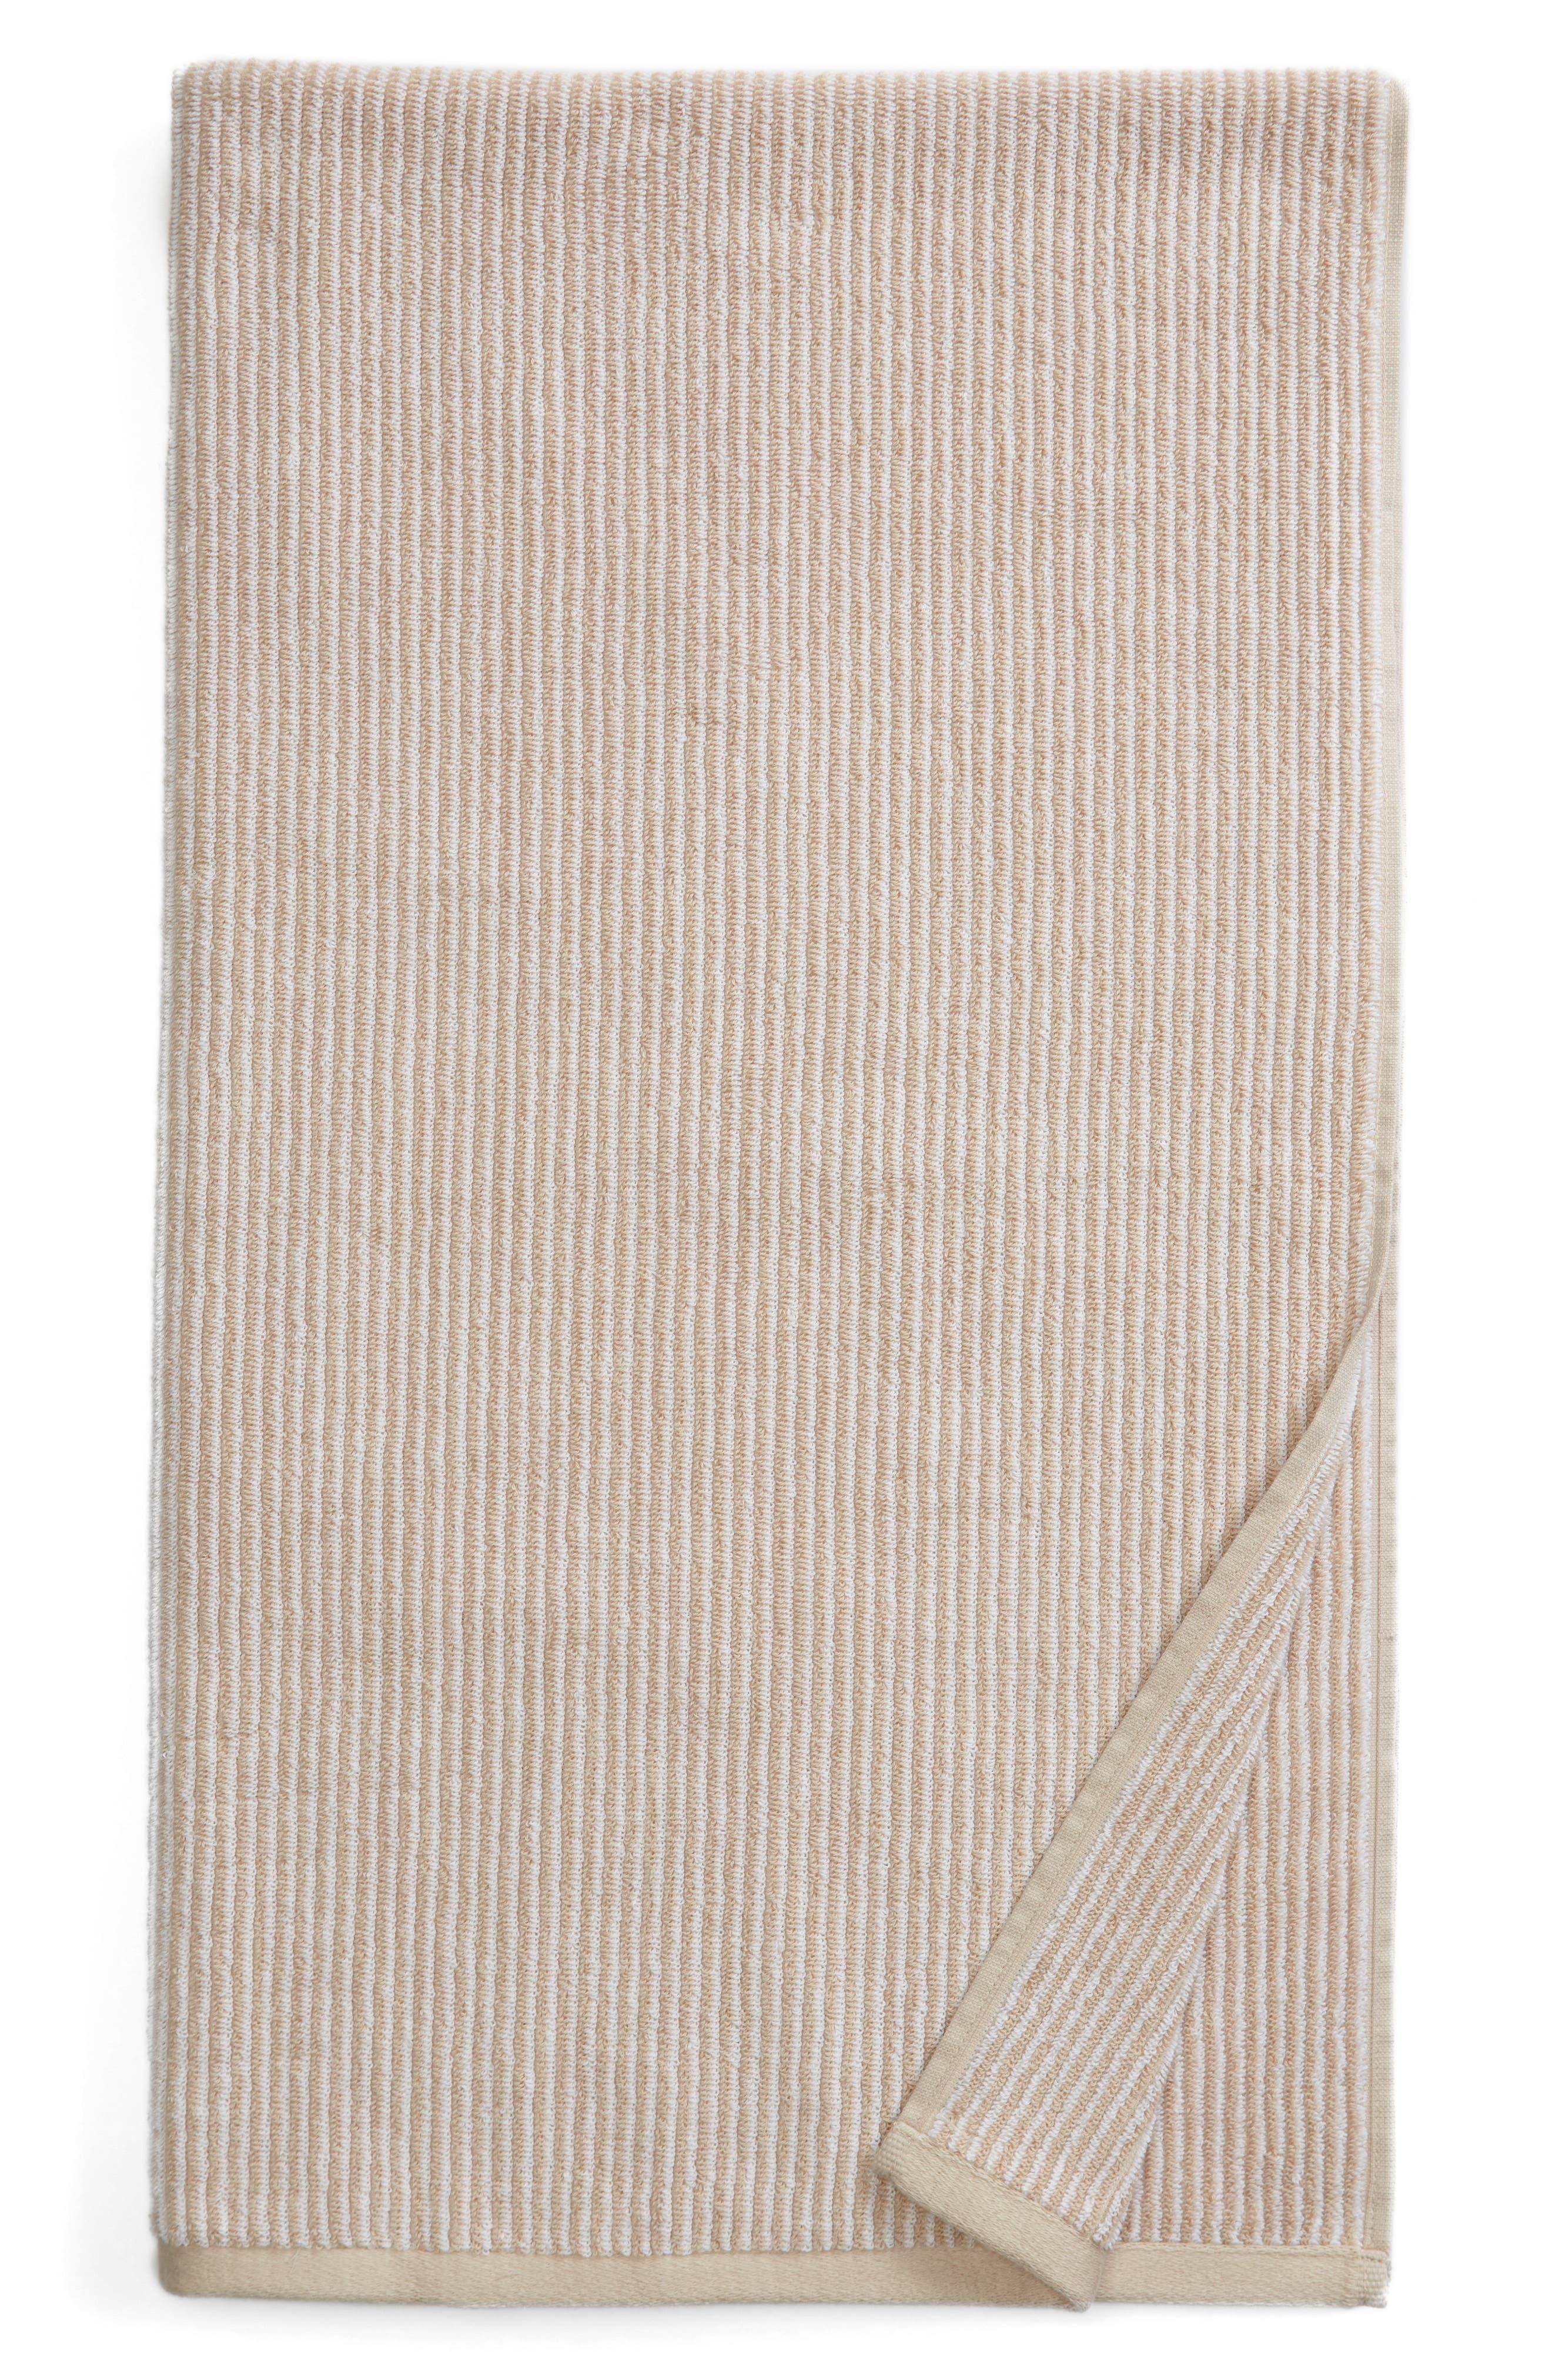 Nordstrom at Home Ezra Stripe 650 Thread Count Bath Towel